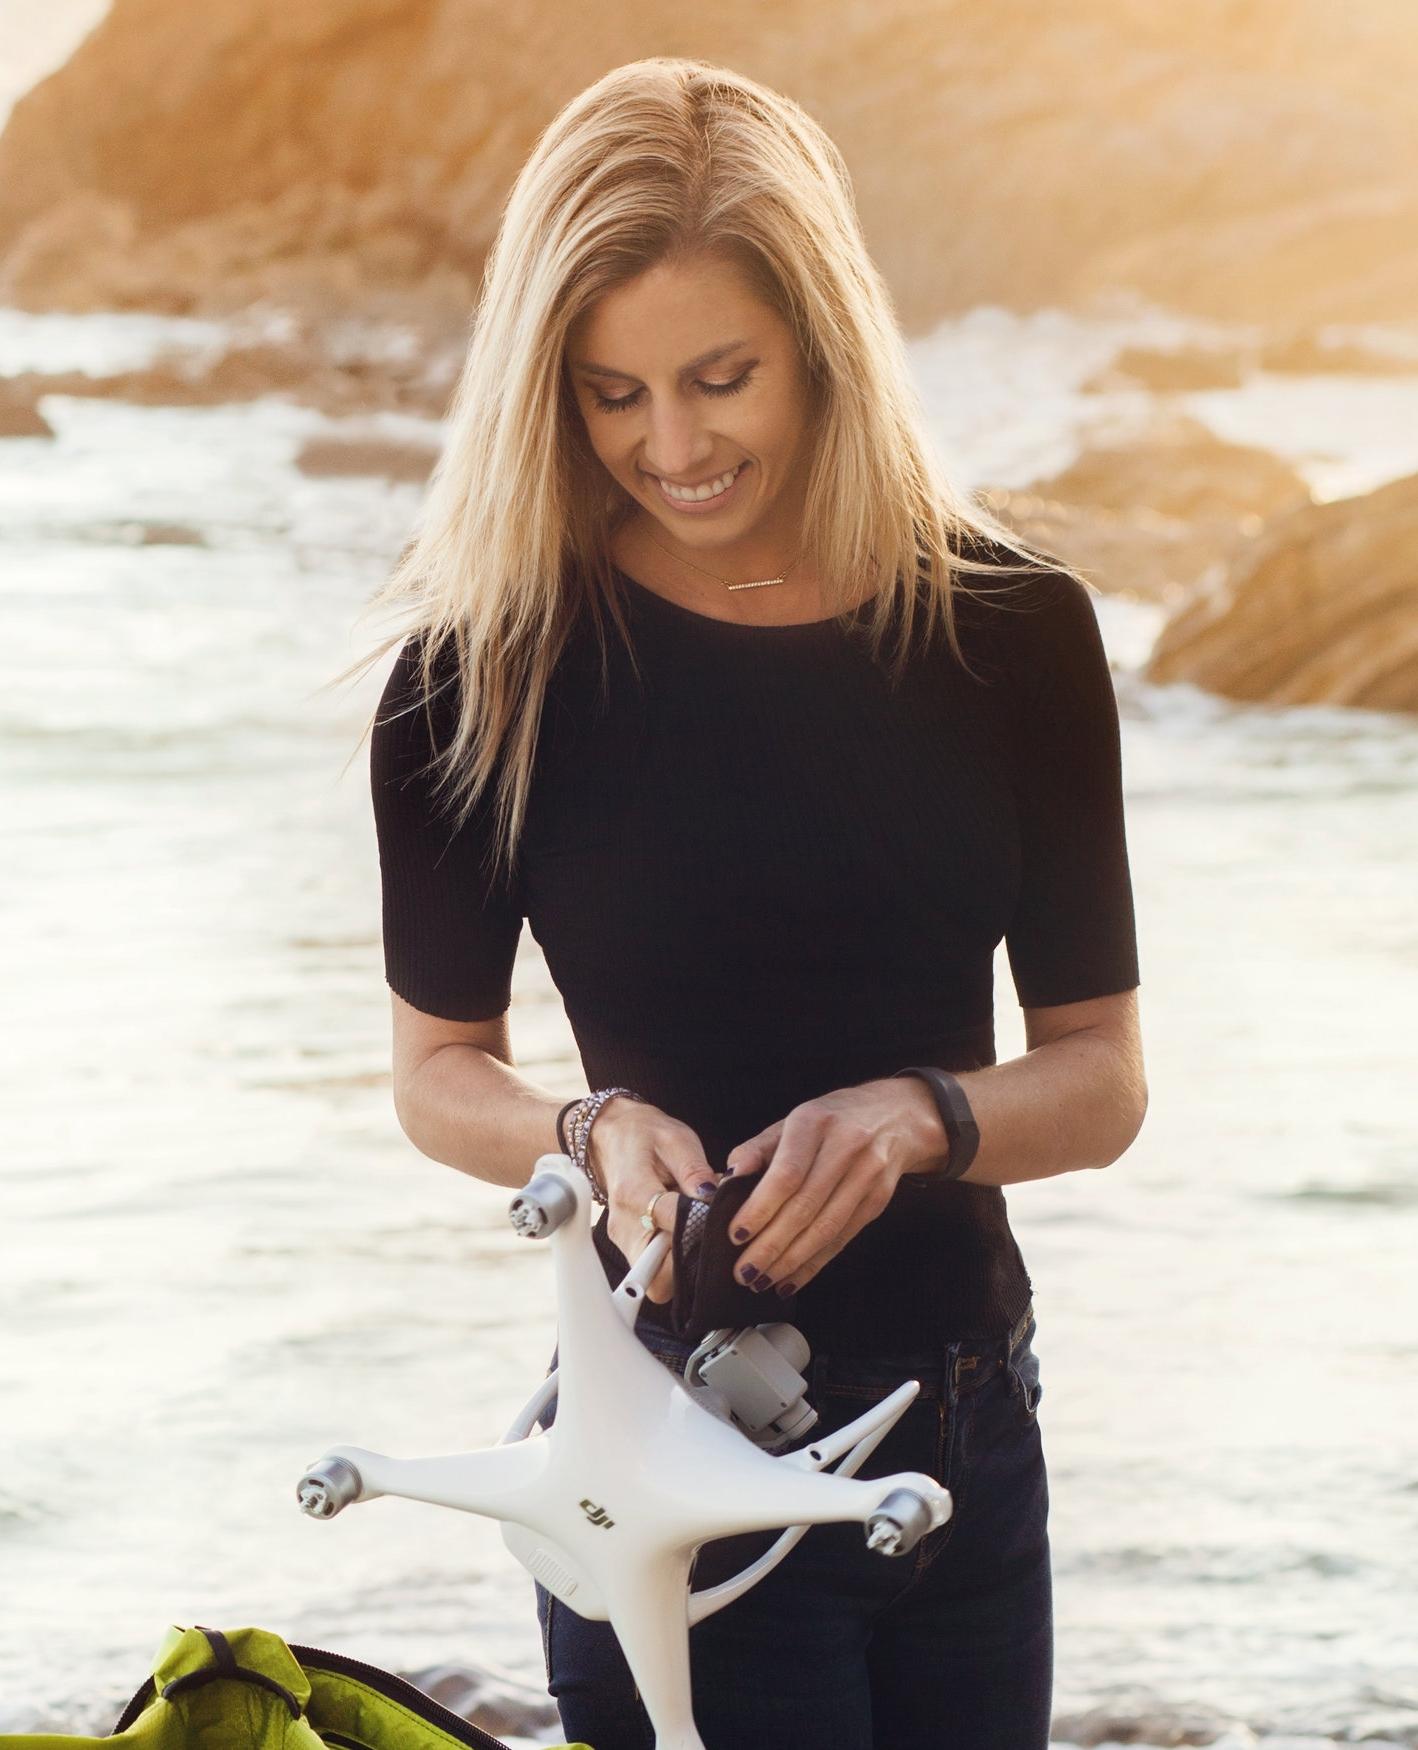 Emily kaszton - Photographer / Droner / Influencer